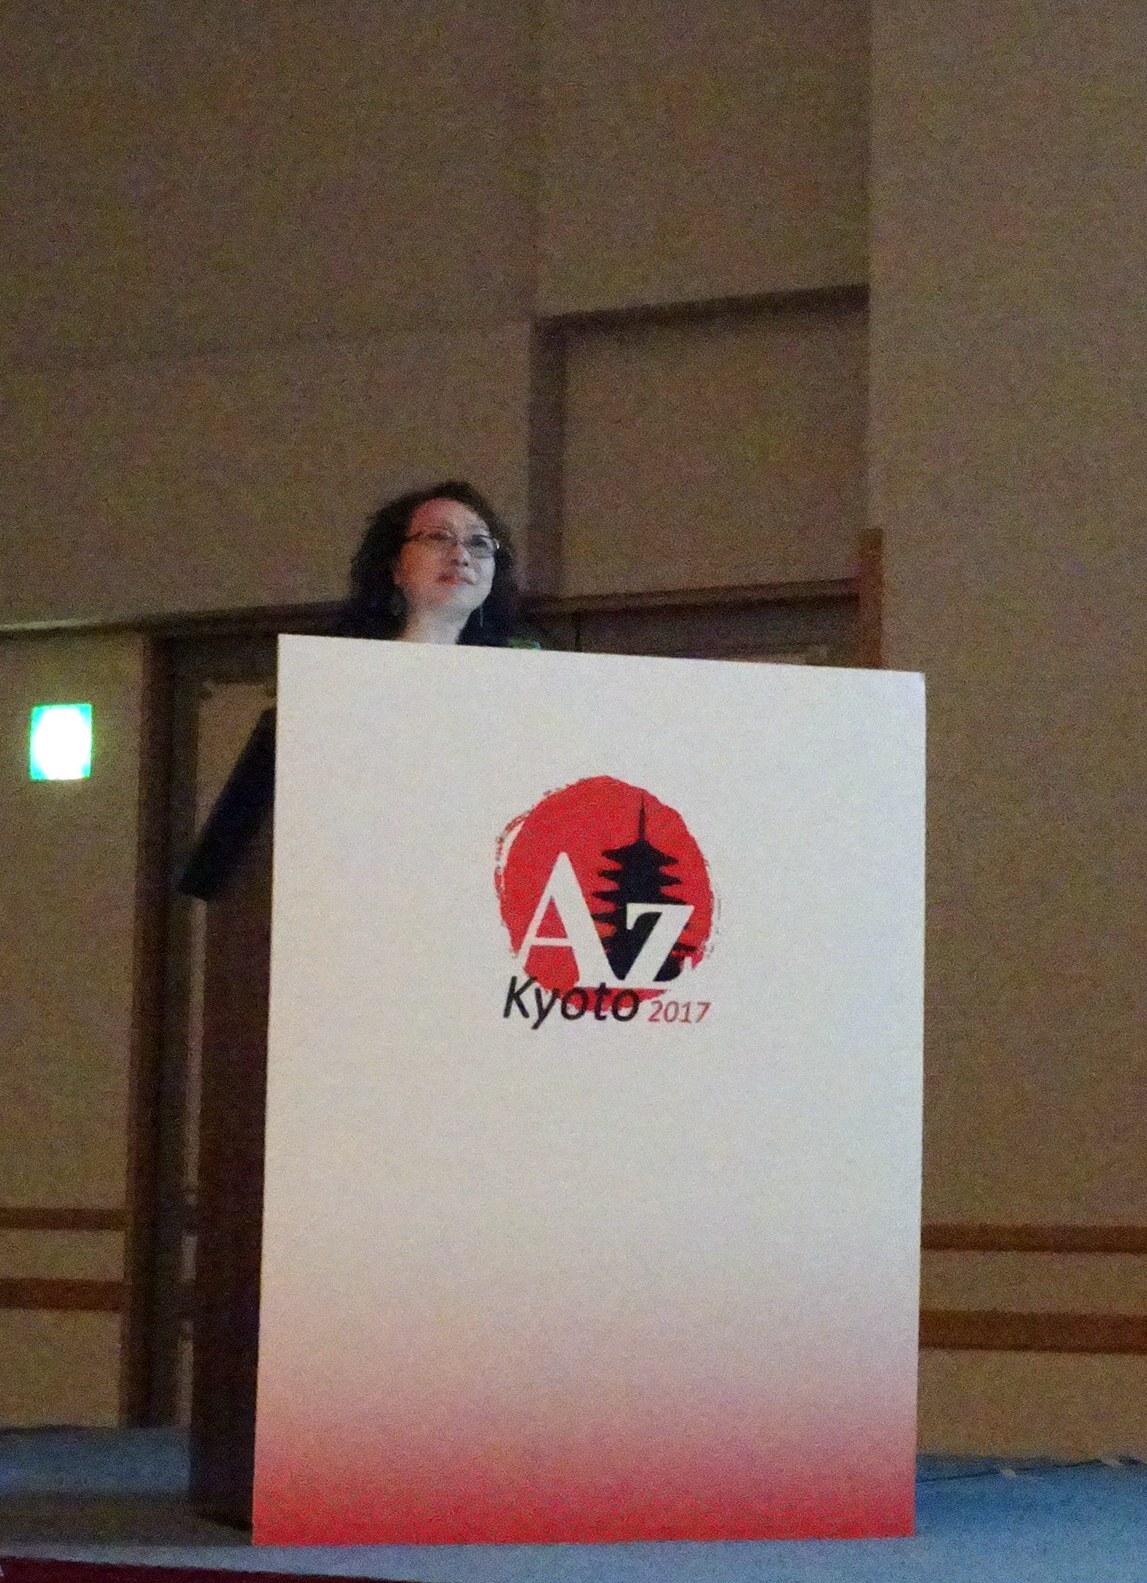 Phuong ADI presentation 1.jpg